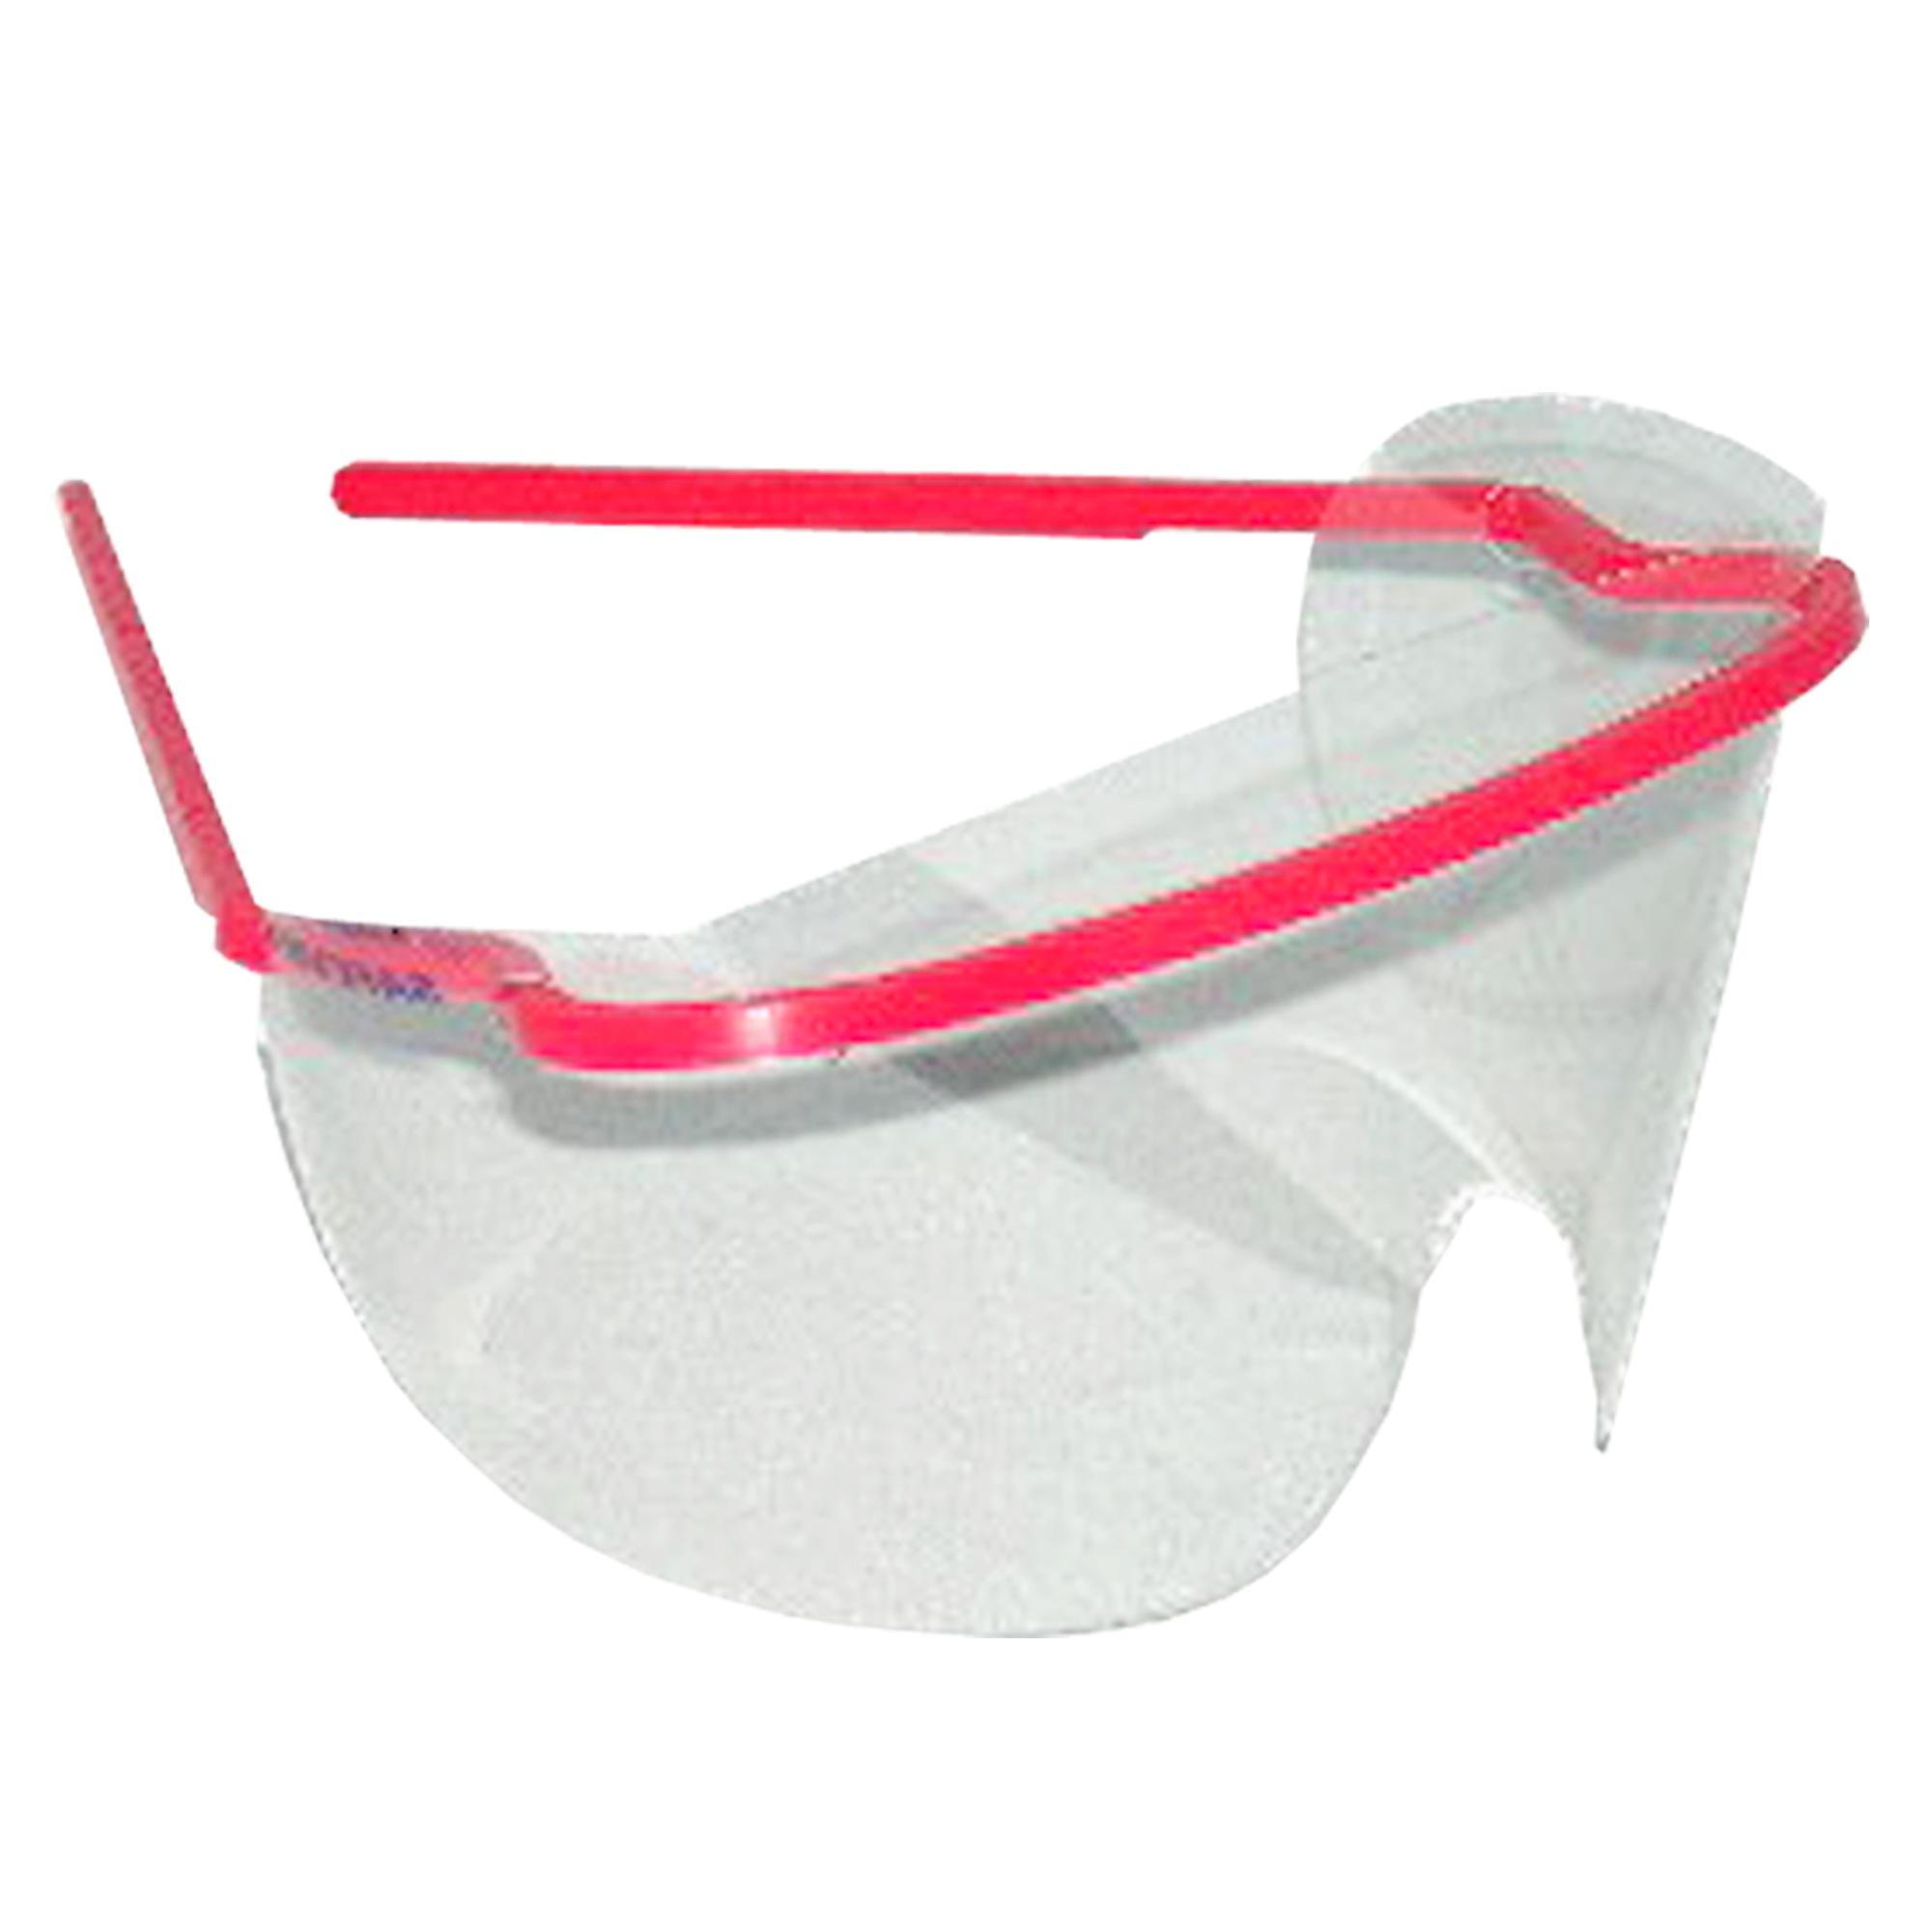 Interlock goggles frame Image